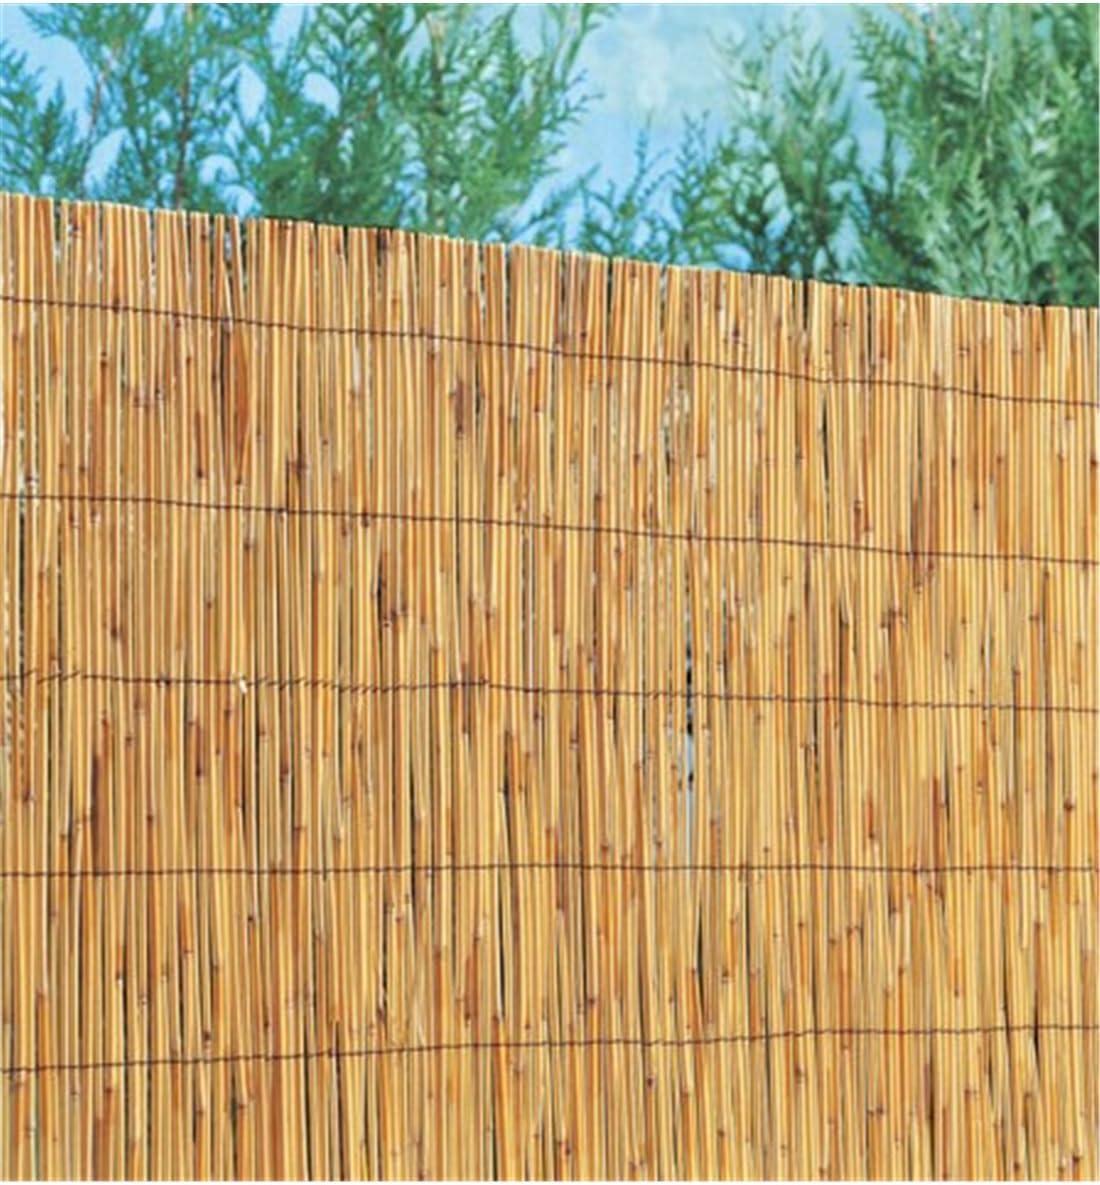 Faura - Bambú Chino Pelado Fino: Amazon.es: Jardín